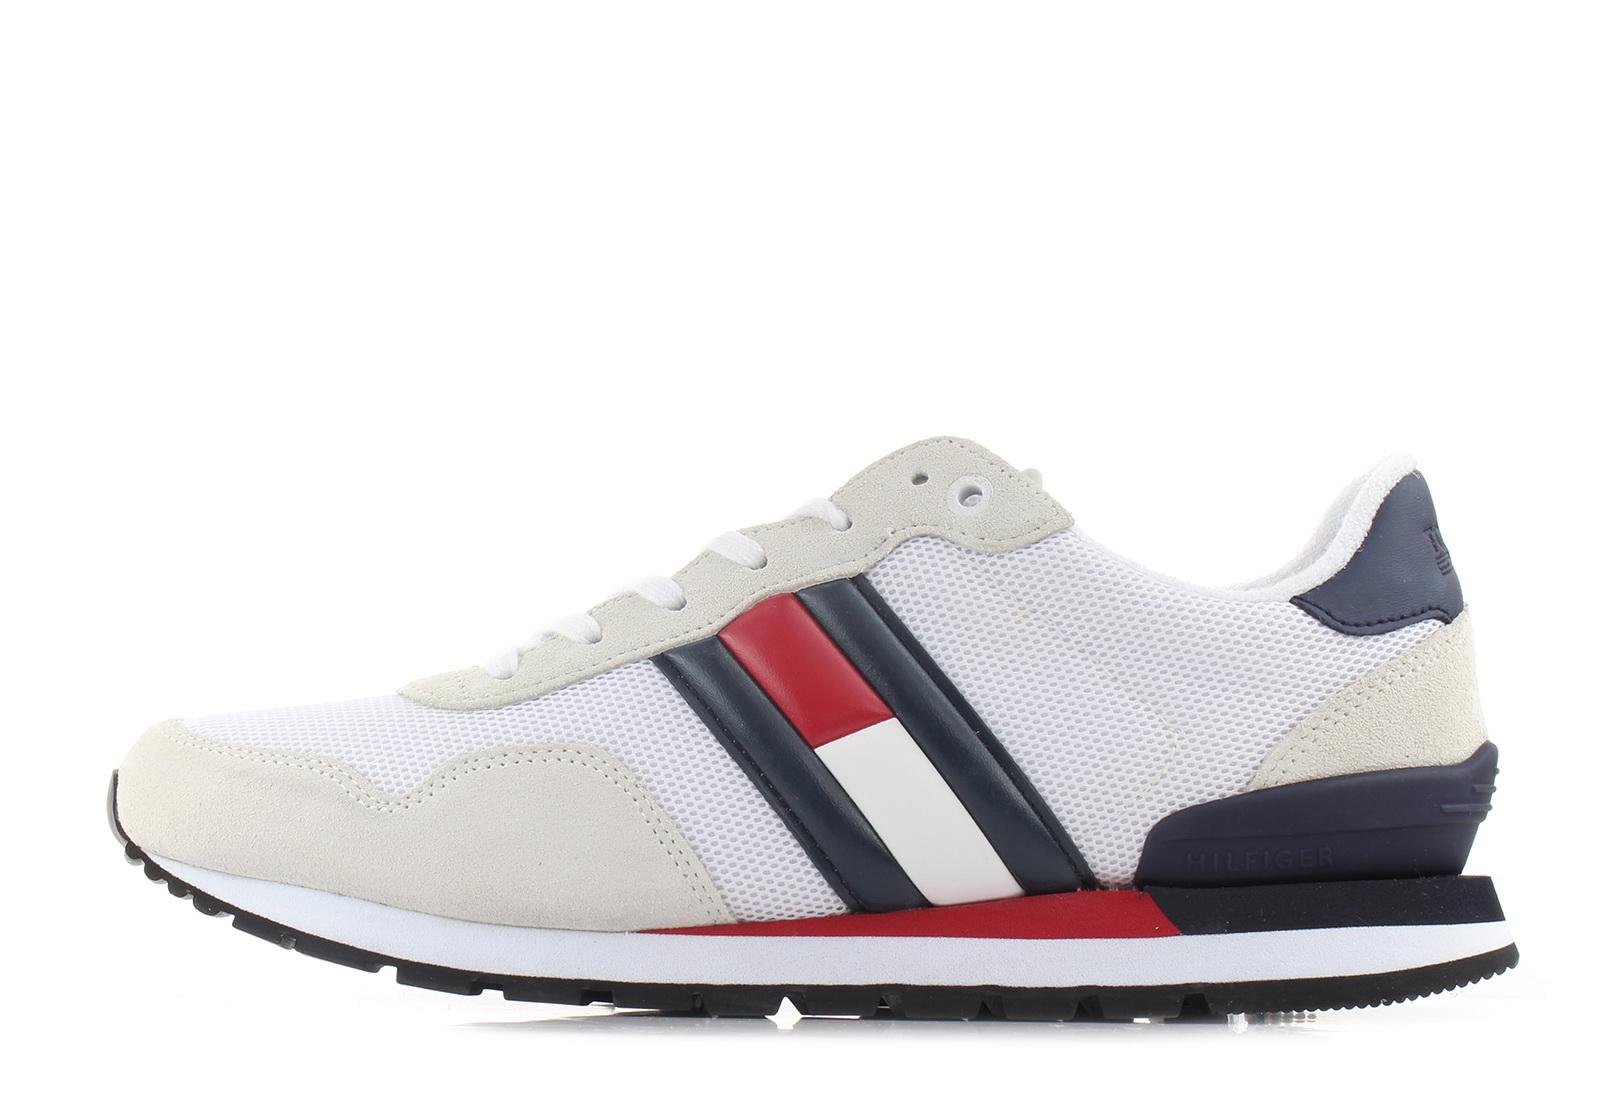 7911ad241f Tommy Hilfiger Cipő - Baron 1c - 19S-0261-020 - Office Shoes ...